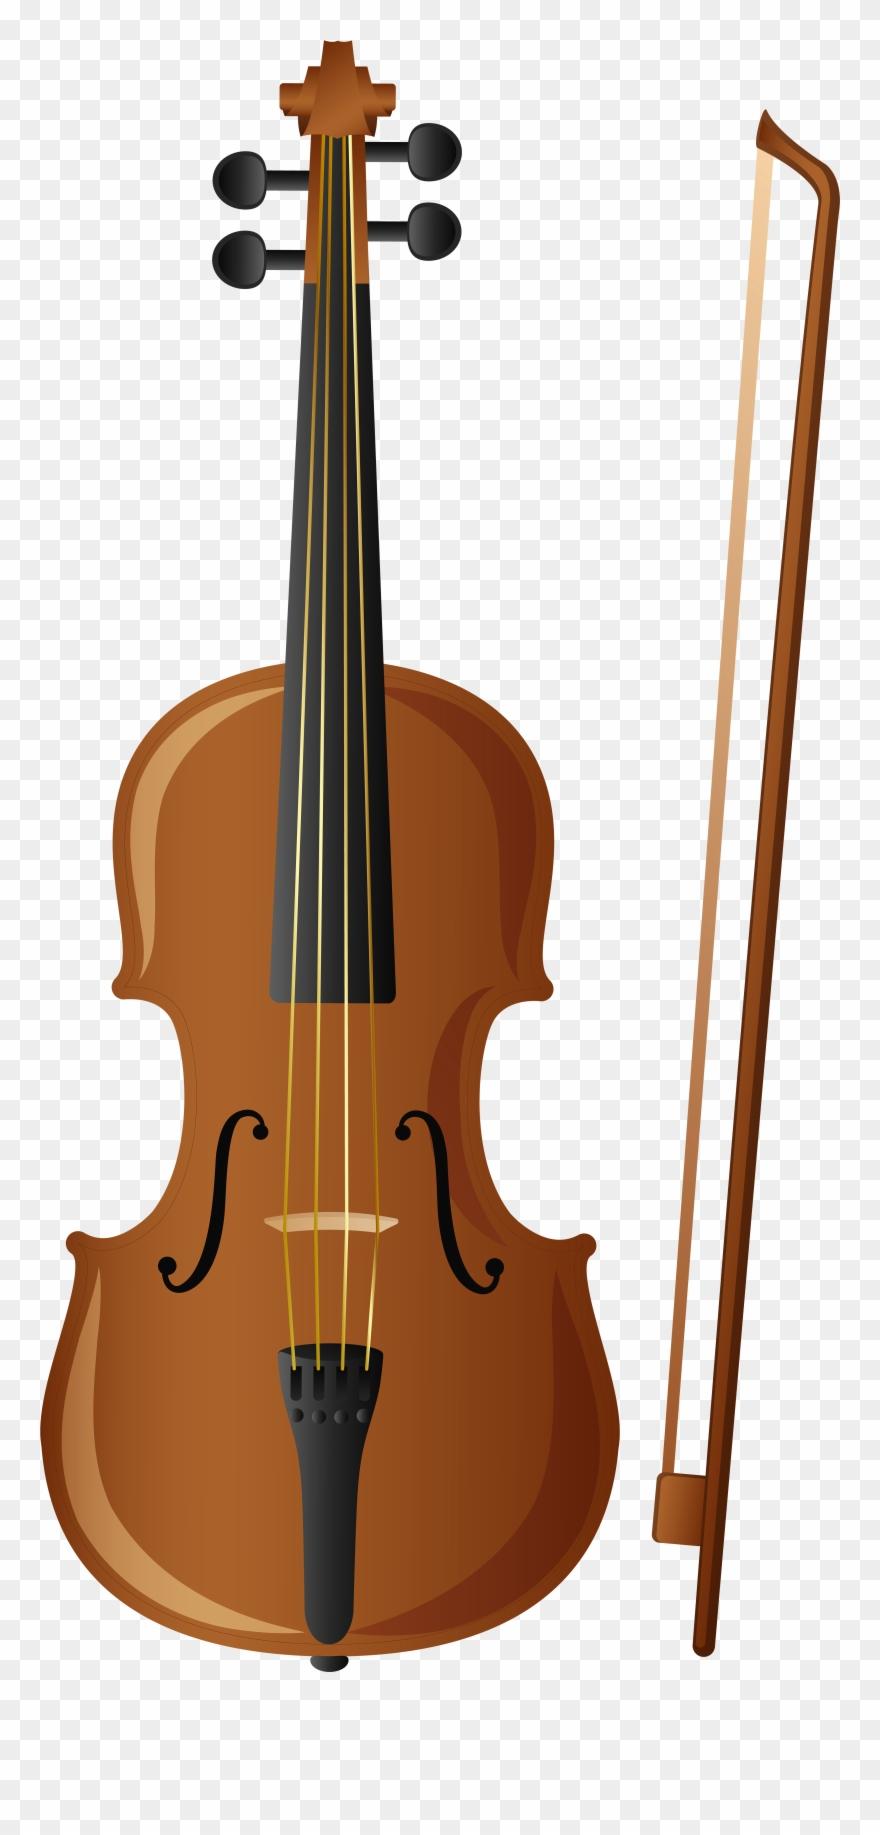 Violin clipart transparent banner black and white stock Clip Art Violin Png Transparent Png (#123681) - PinClipart banner black and white stock